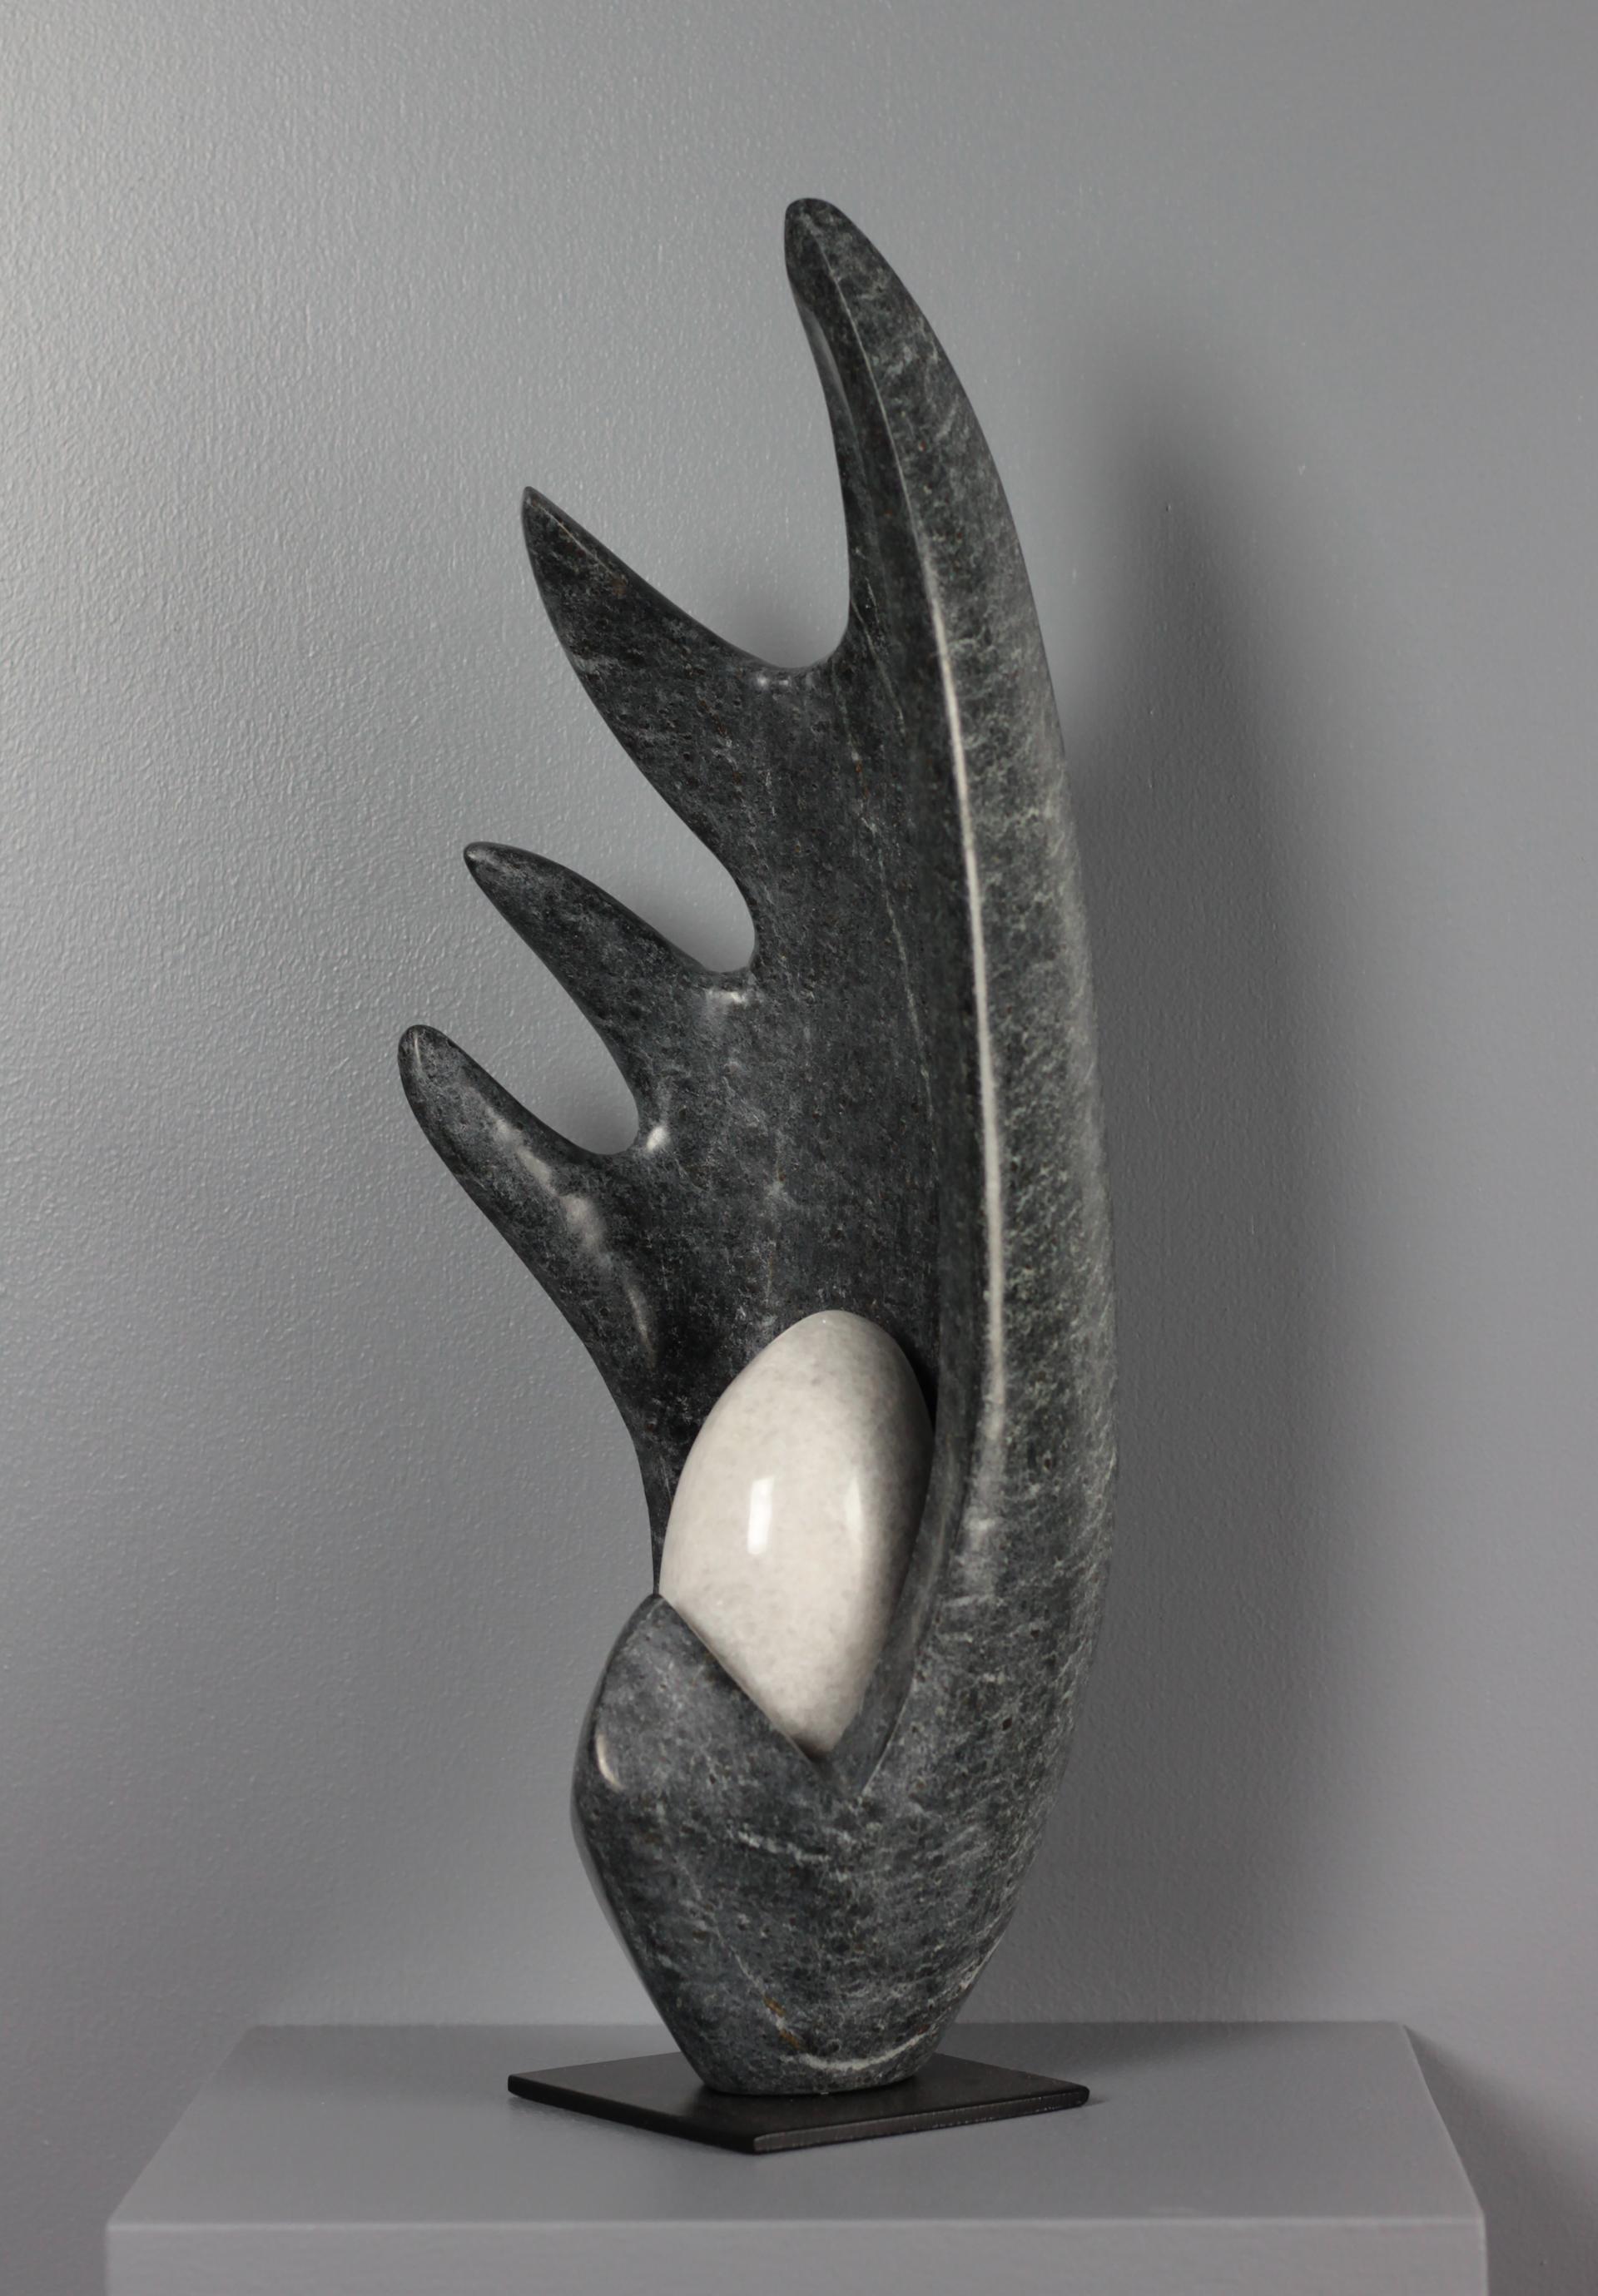 Relic by John McLeod